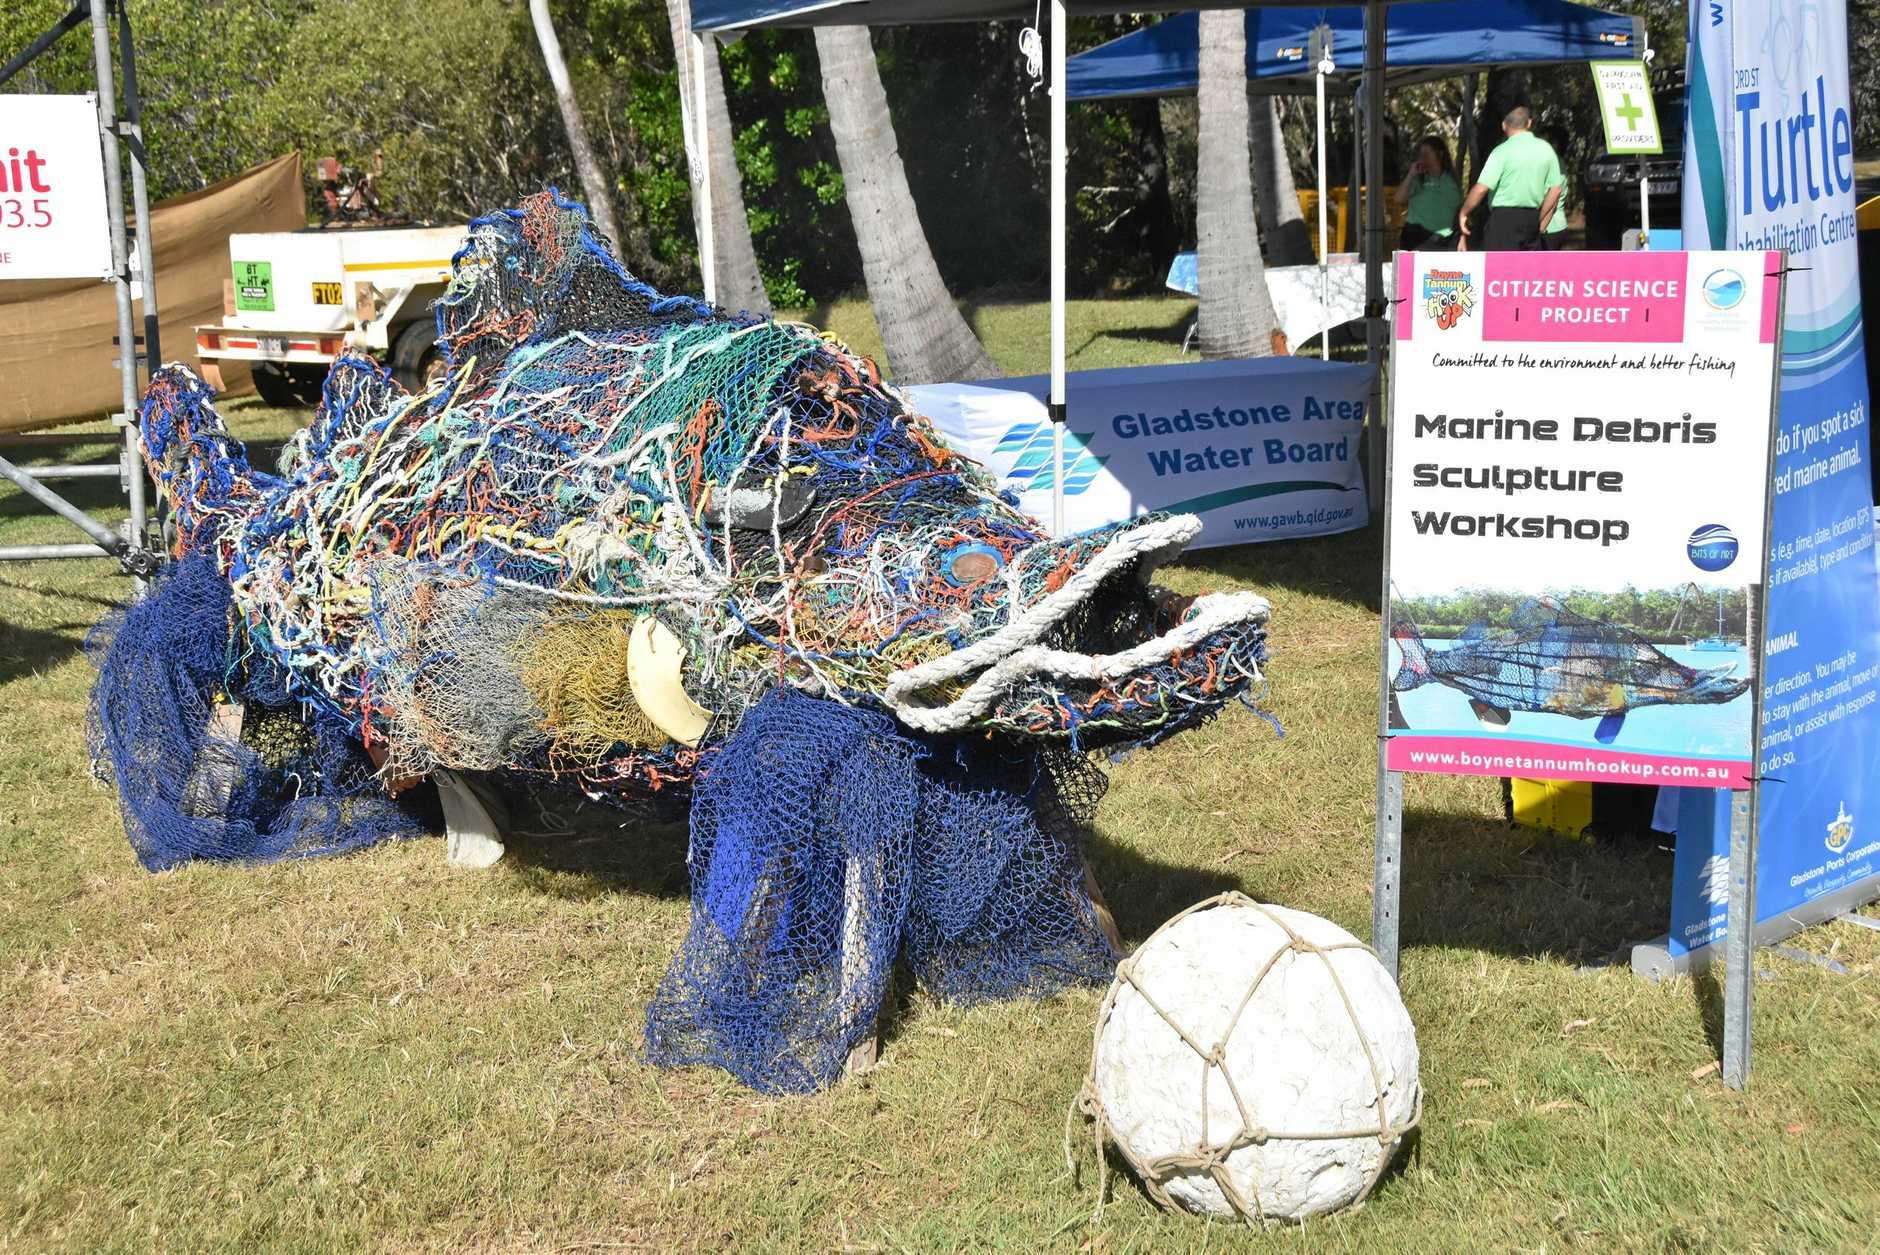 Christine Holden's marine debris sculpture - a 4.5m barramundi she made for the 2017 HookUp.